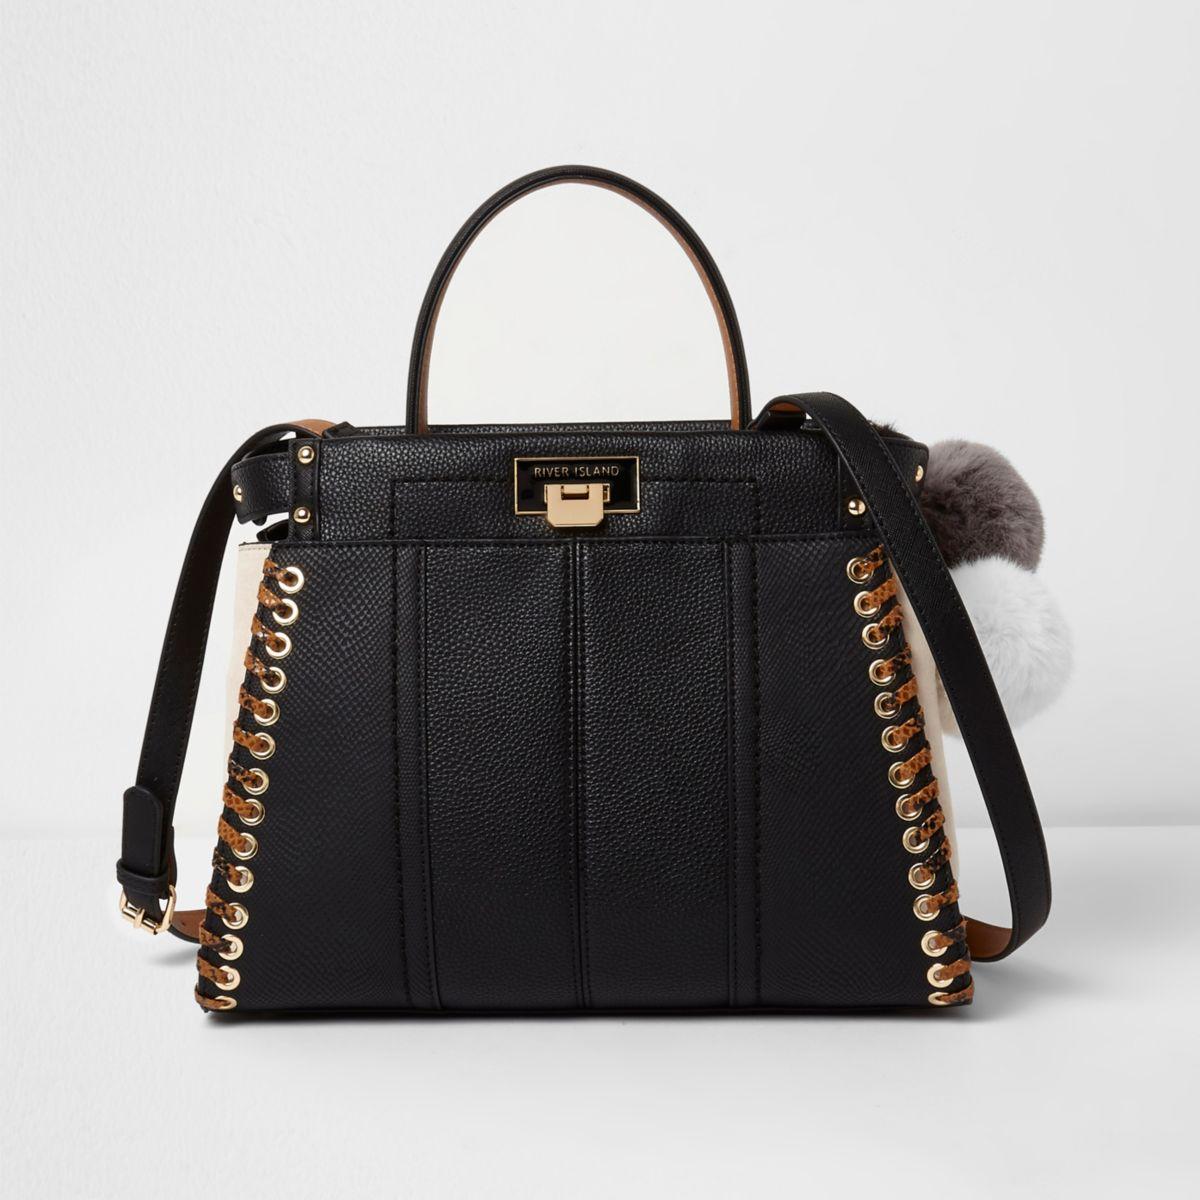 Black stitch side cross body tote bag